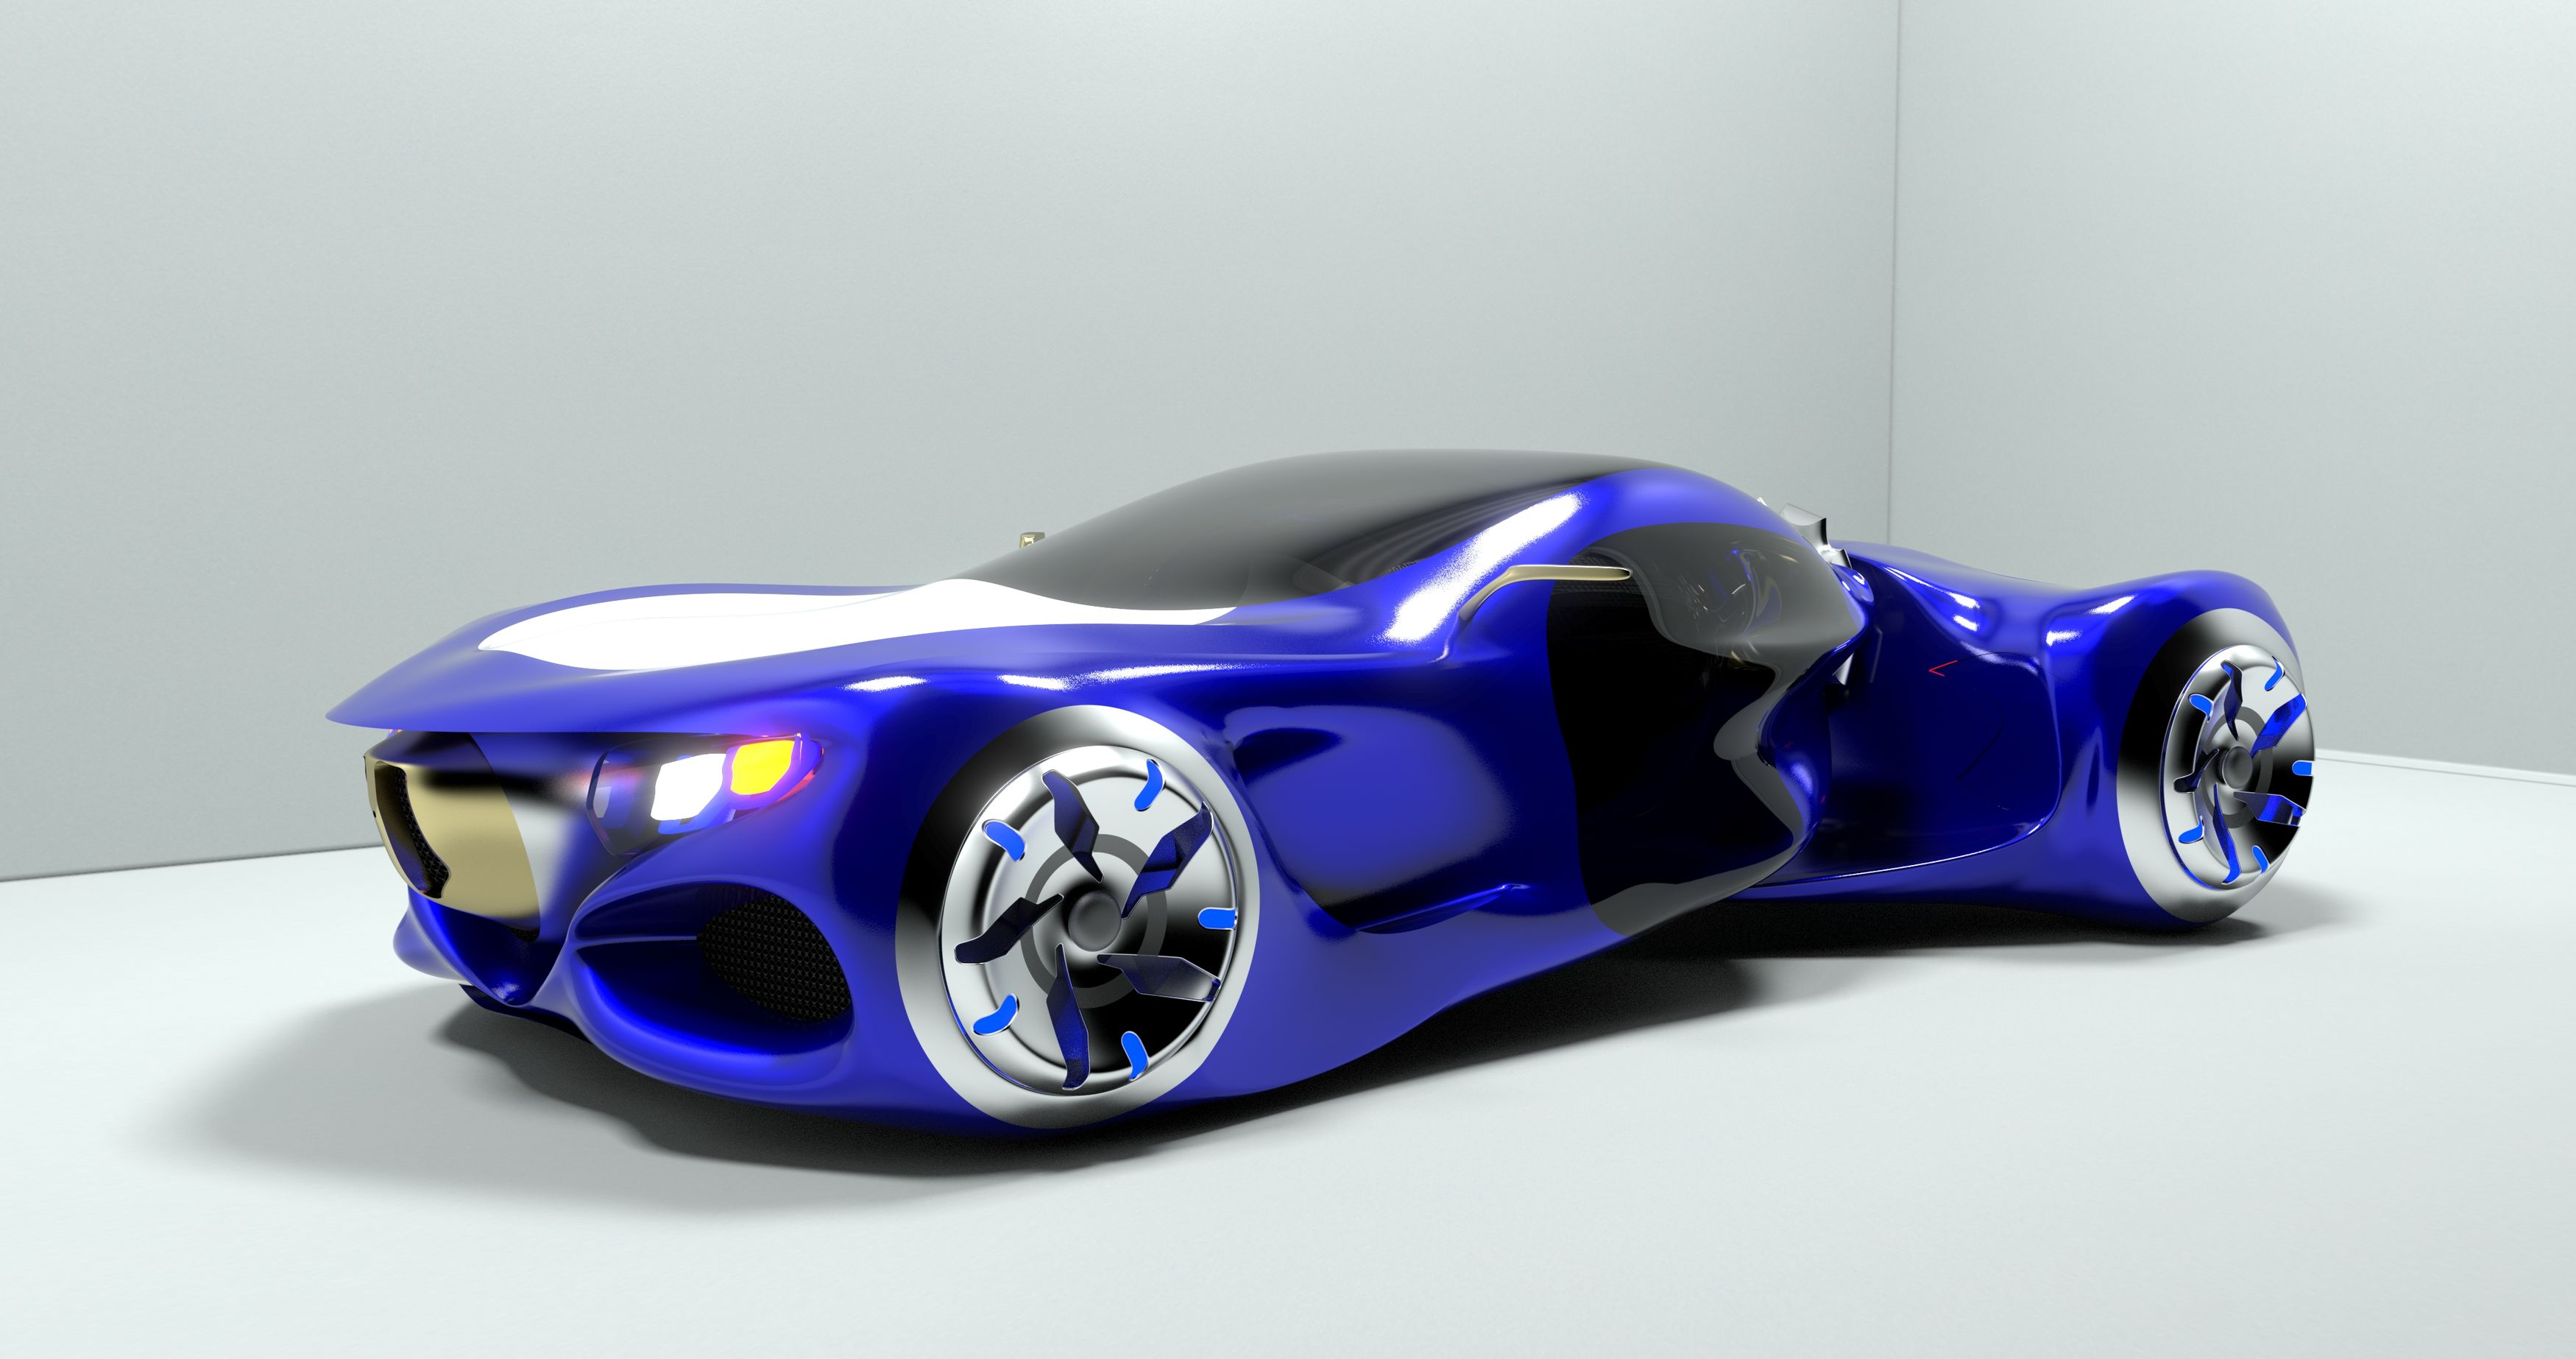 Vox-1-3500-3500